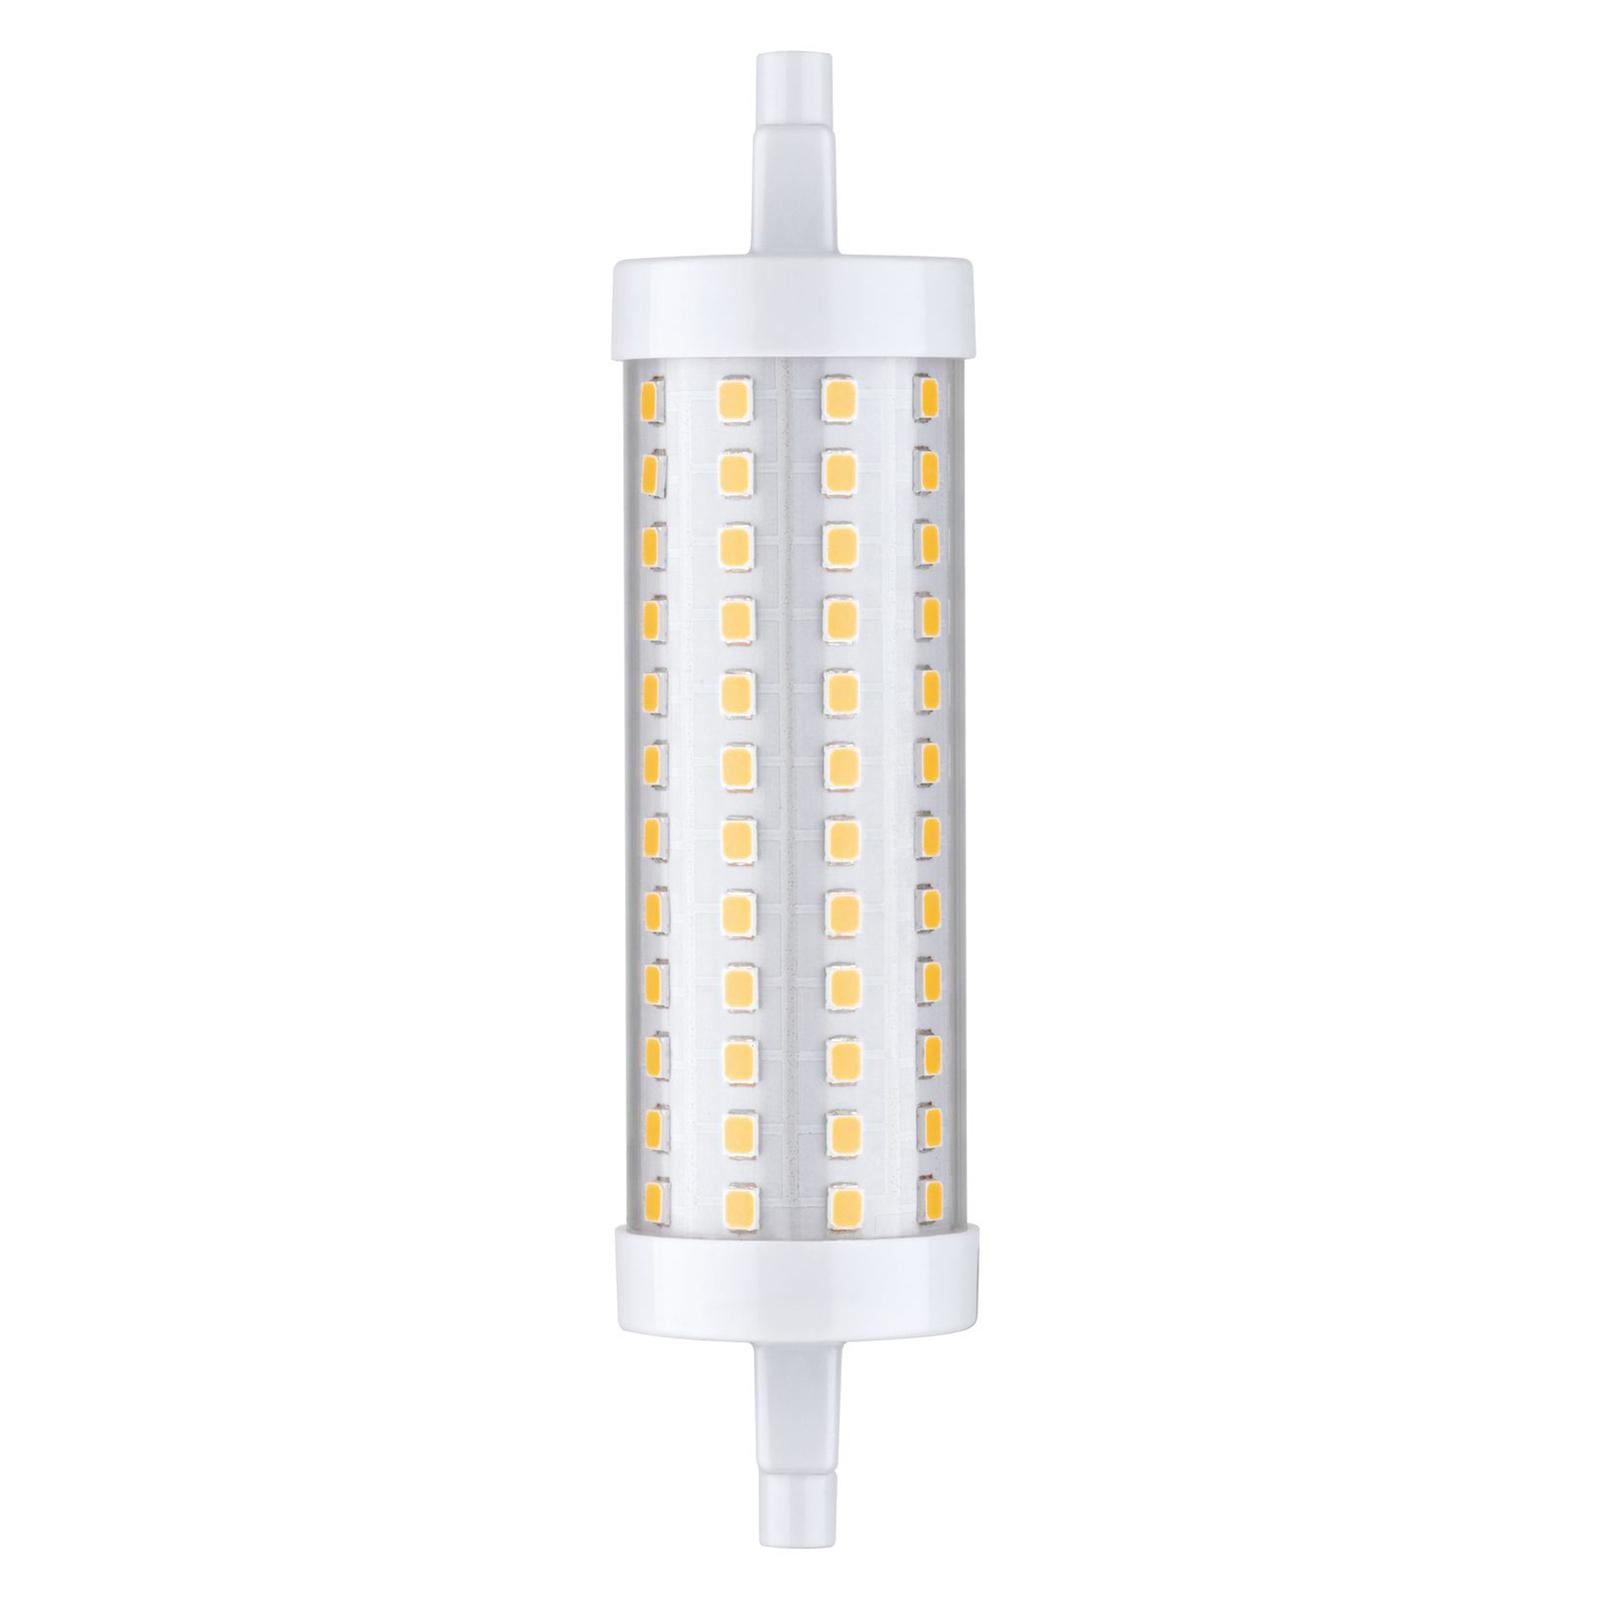 Paulmann LED R7s 118mm 13W 1.521lm dimmerabile